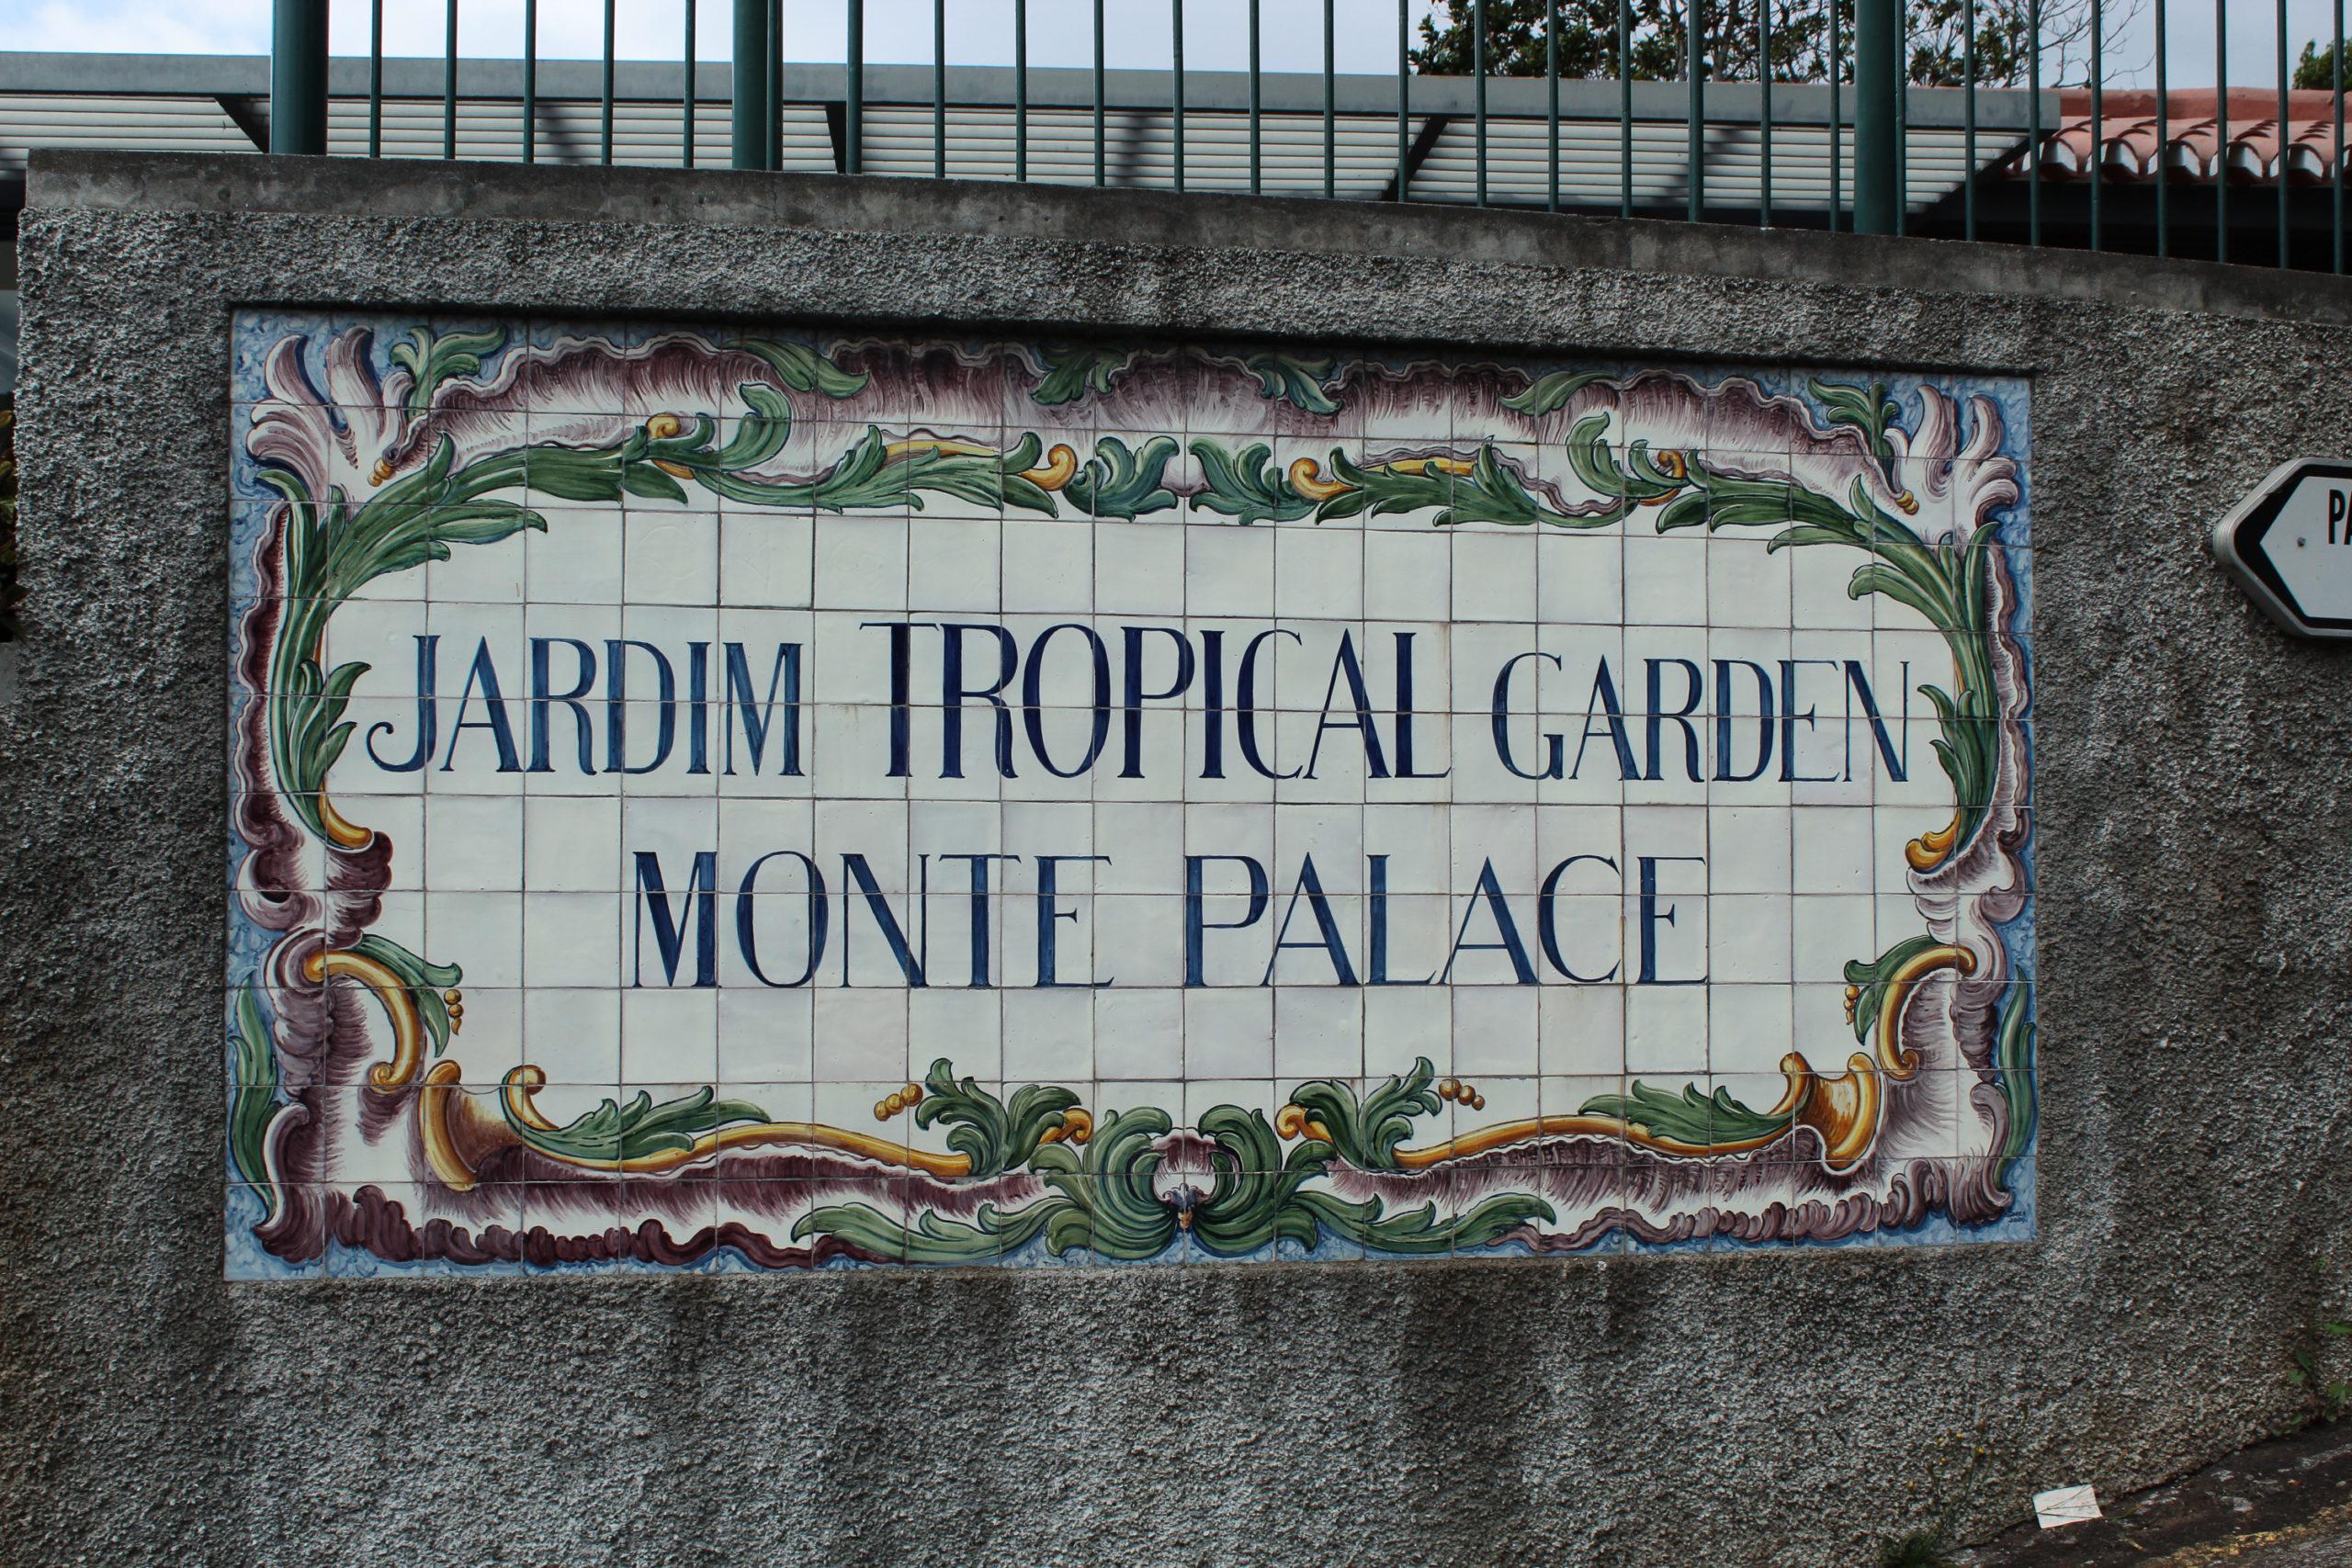 madera jardim tropical garden monta palace